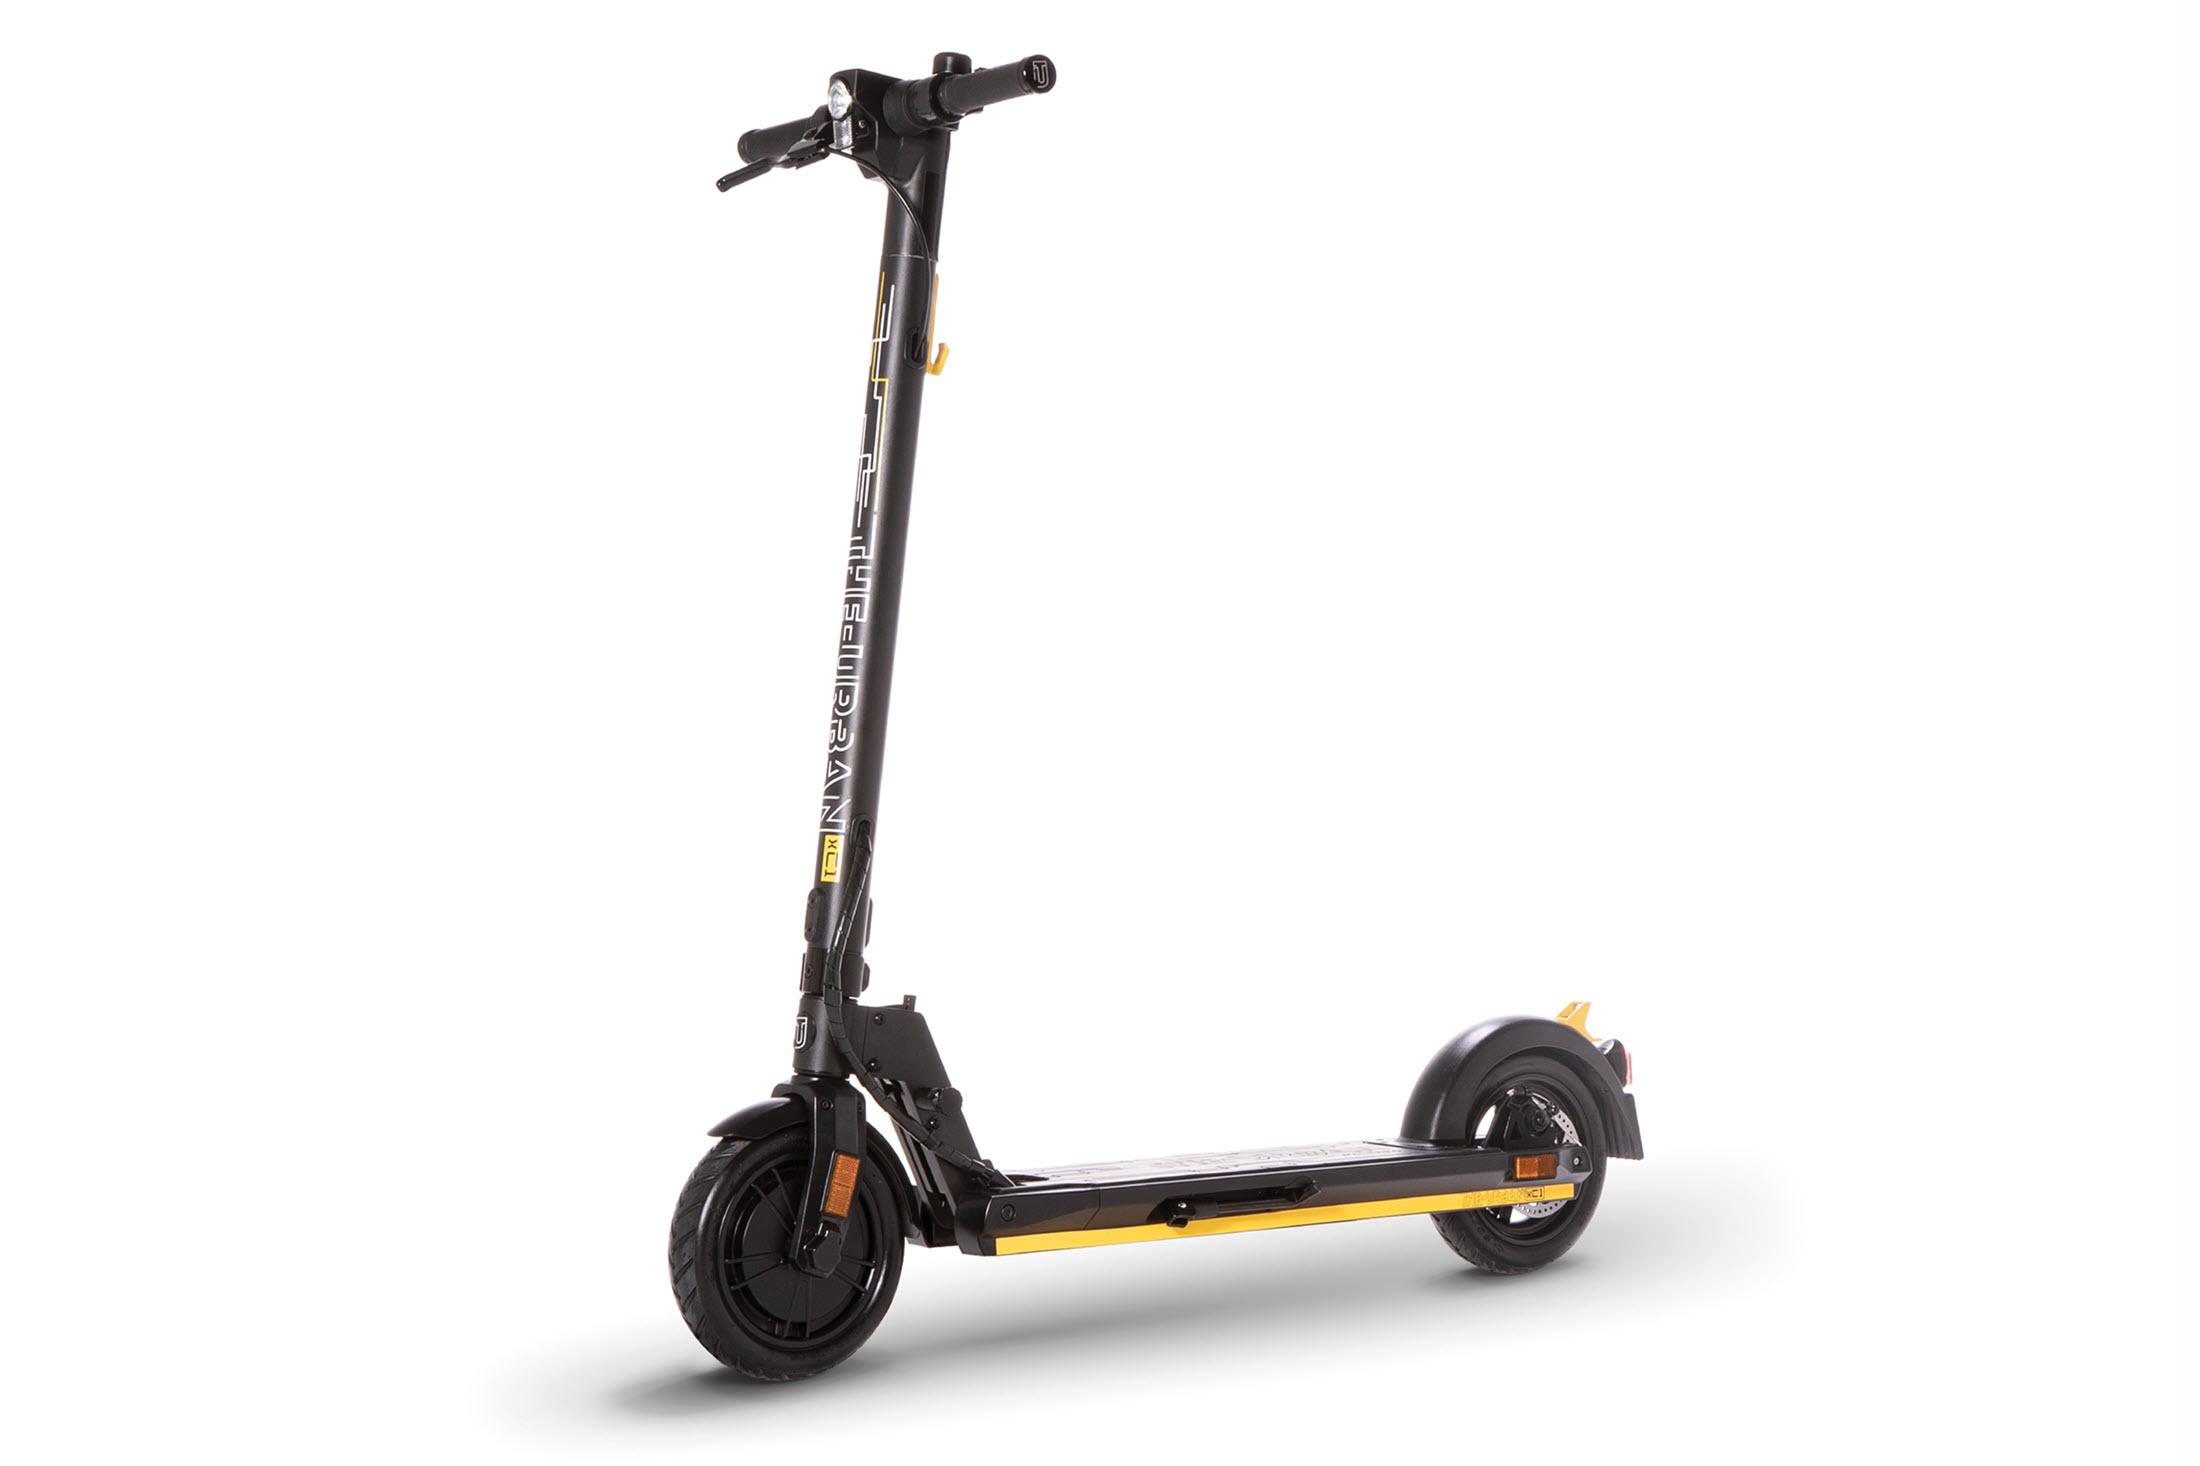 E-Scooter THE-URBAN xC1 mit Straßenzulassung nach eKFV